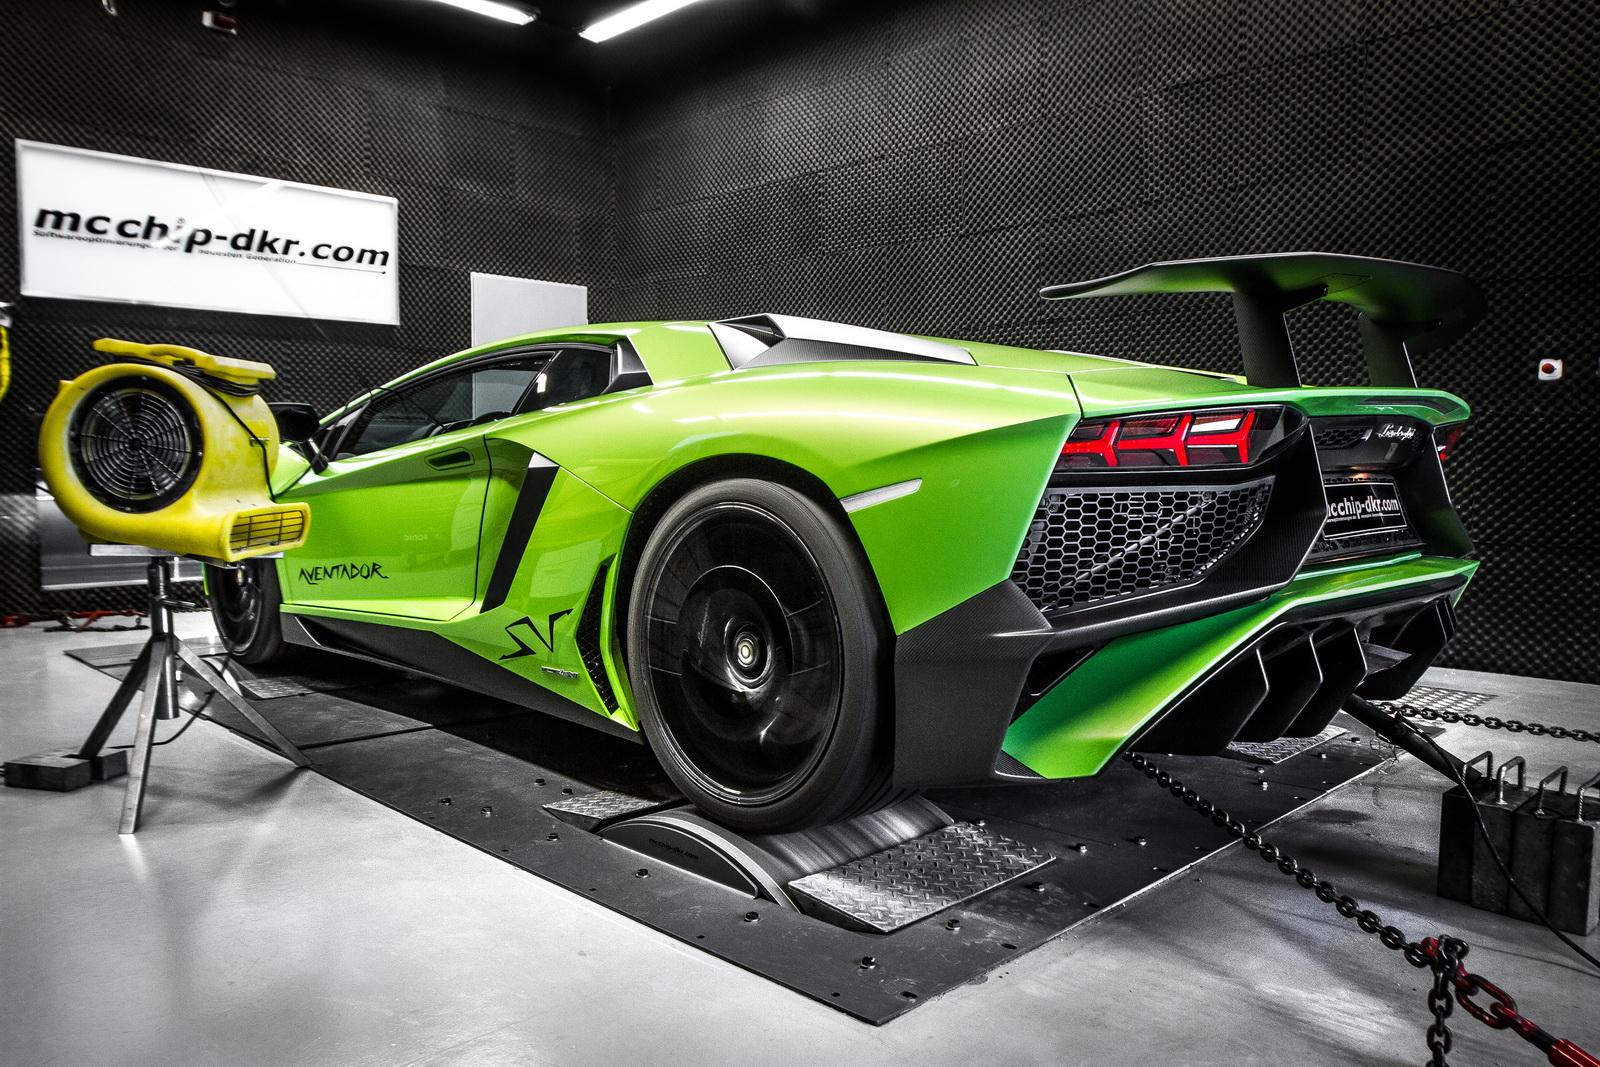 Lamborghini_Aventador_SV_by_Mcchip-DKR_02